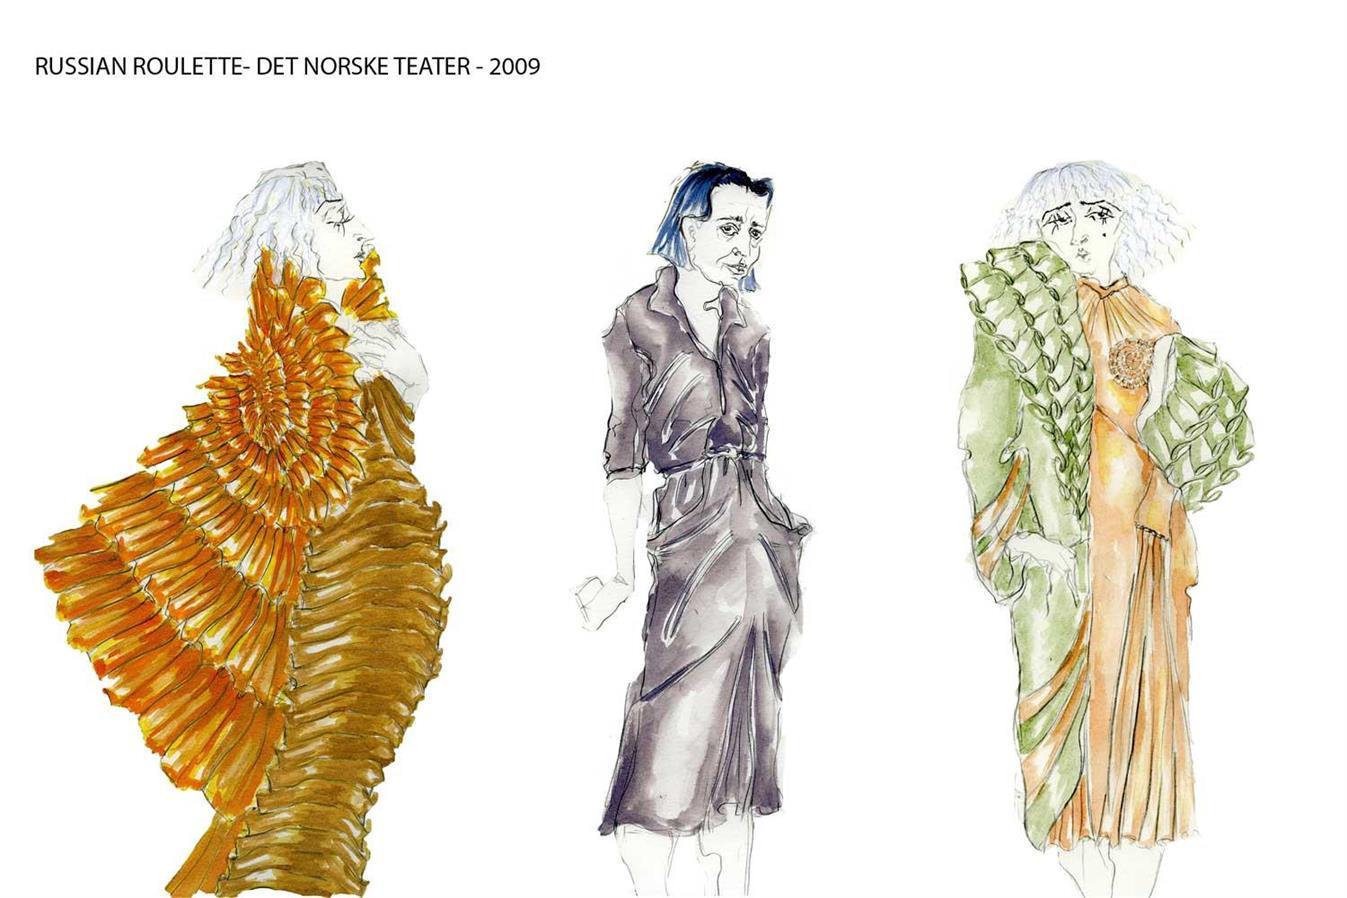 Norway Director: Lasse Kolsrud - Costume design: Christina Lovery